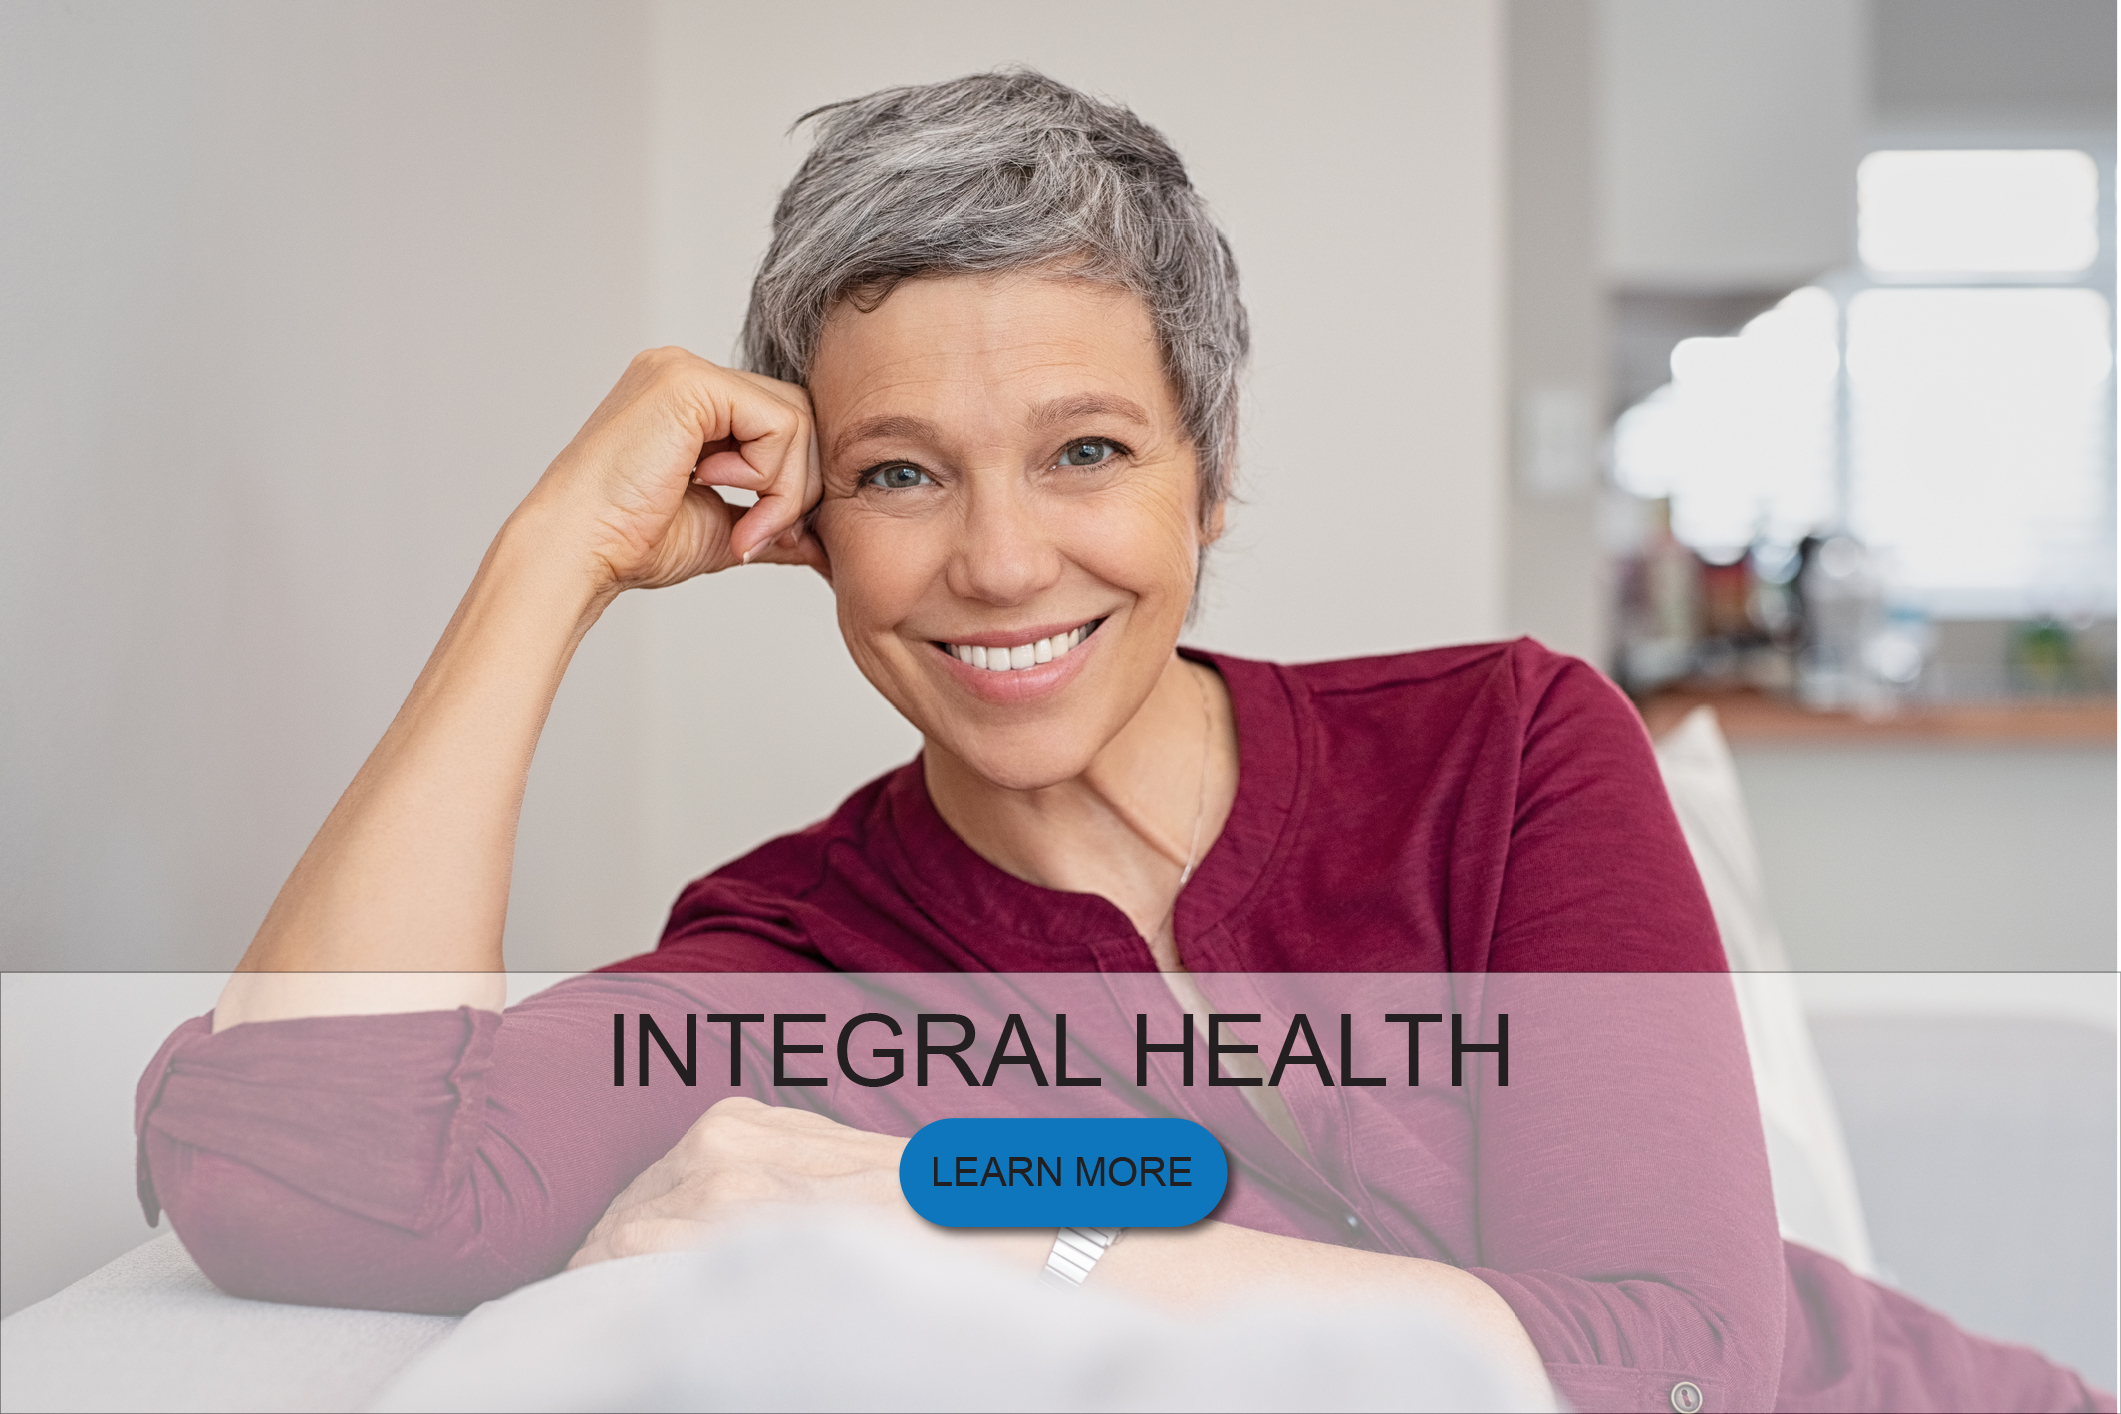 integral_health_banner.jpg